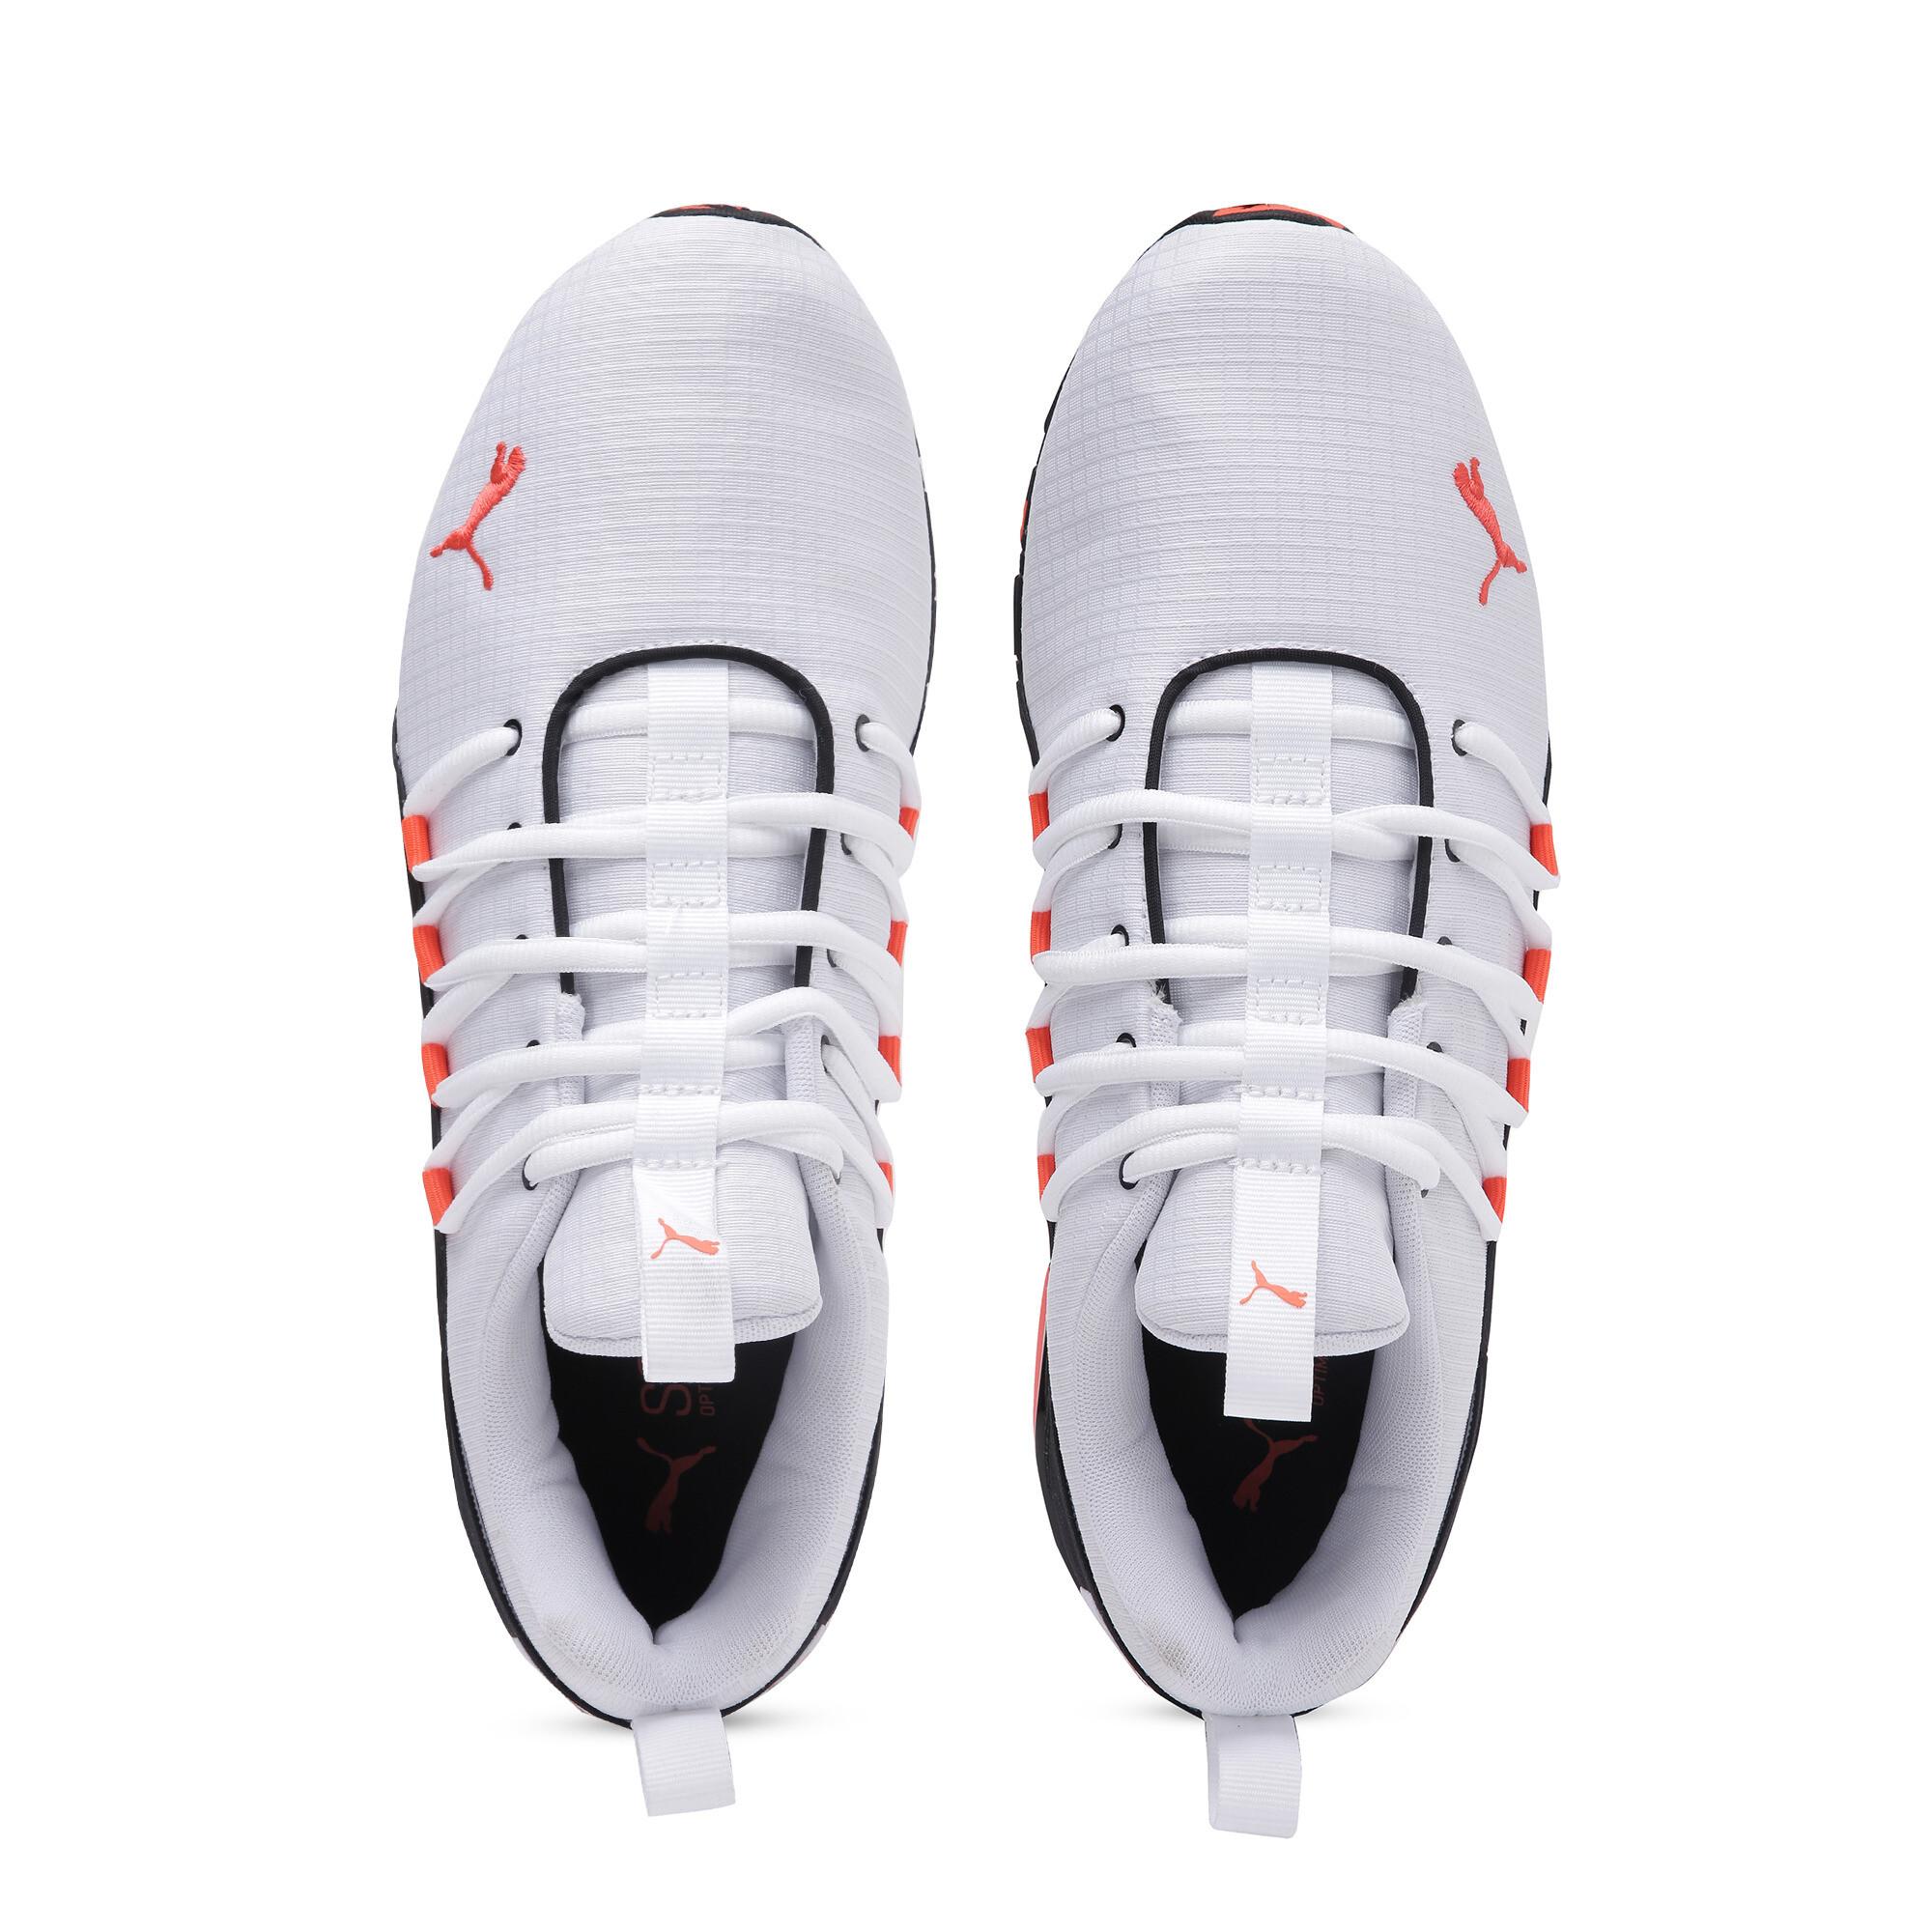 PUMA-Men-039-s-Axelion-Rip-Training-Shoes thumbnail 8